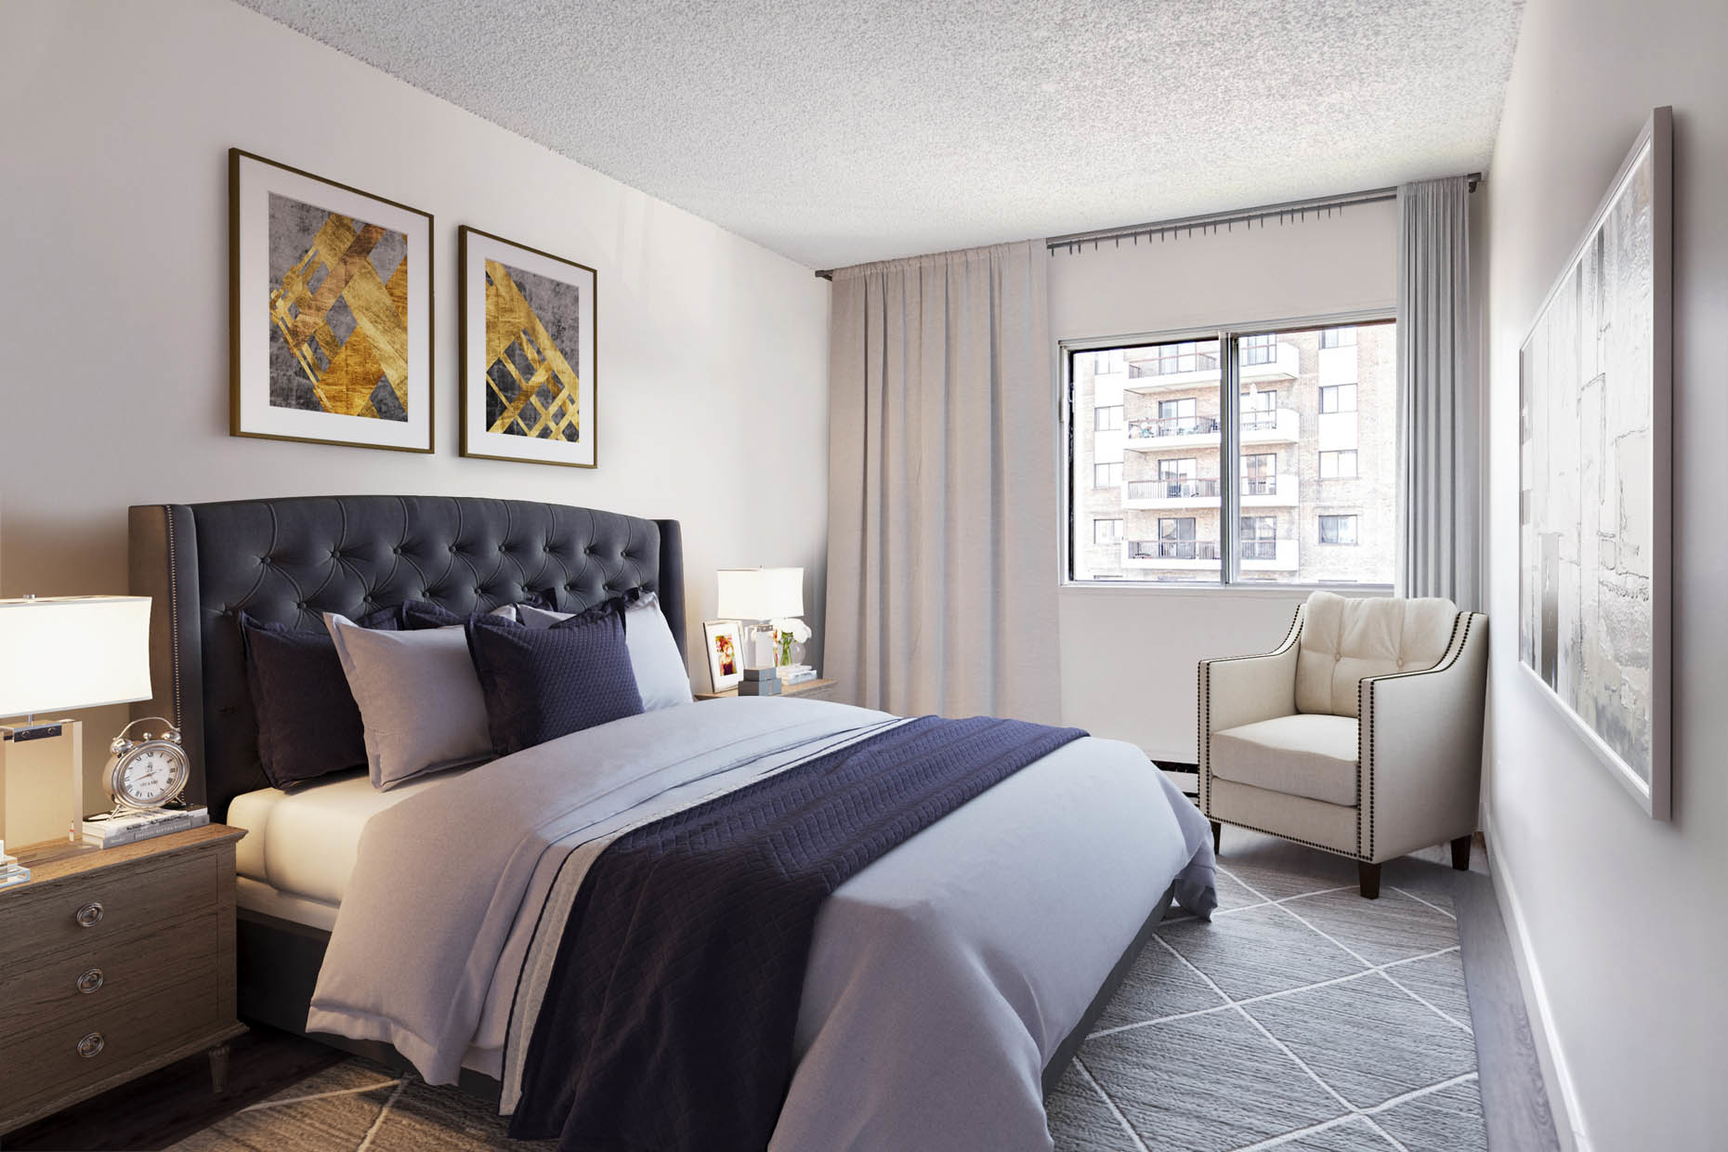 1 bedroom Apartments for rent in Ville St-Laurent - Bois-Franc at Complexe Deguire - Photo 03 - RentQuebecApartments – L407181